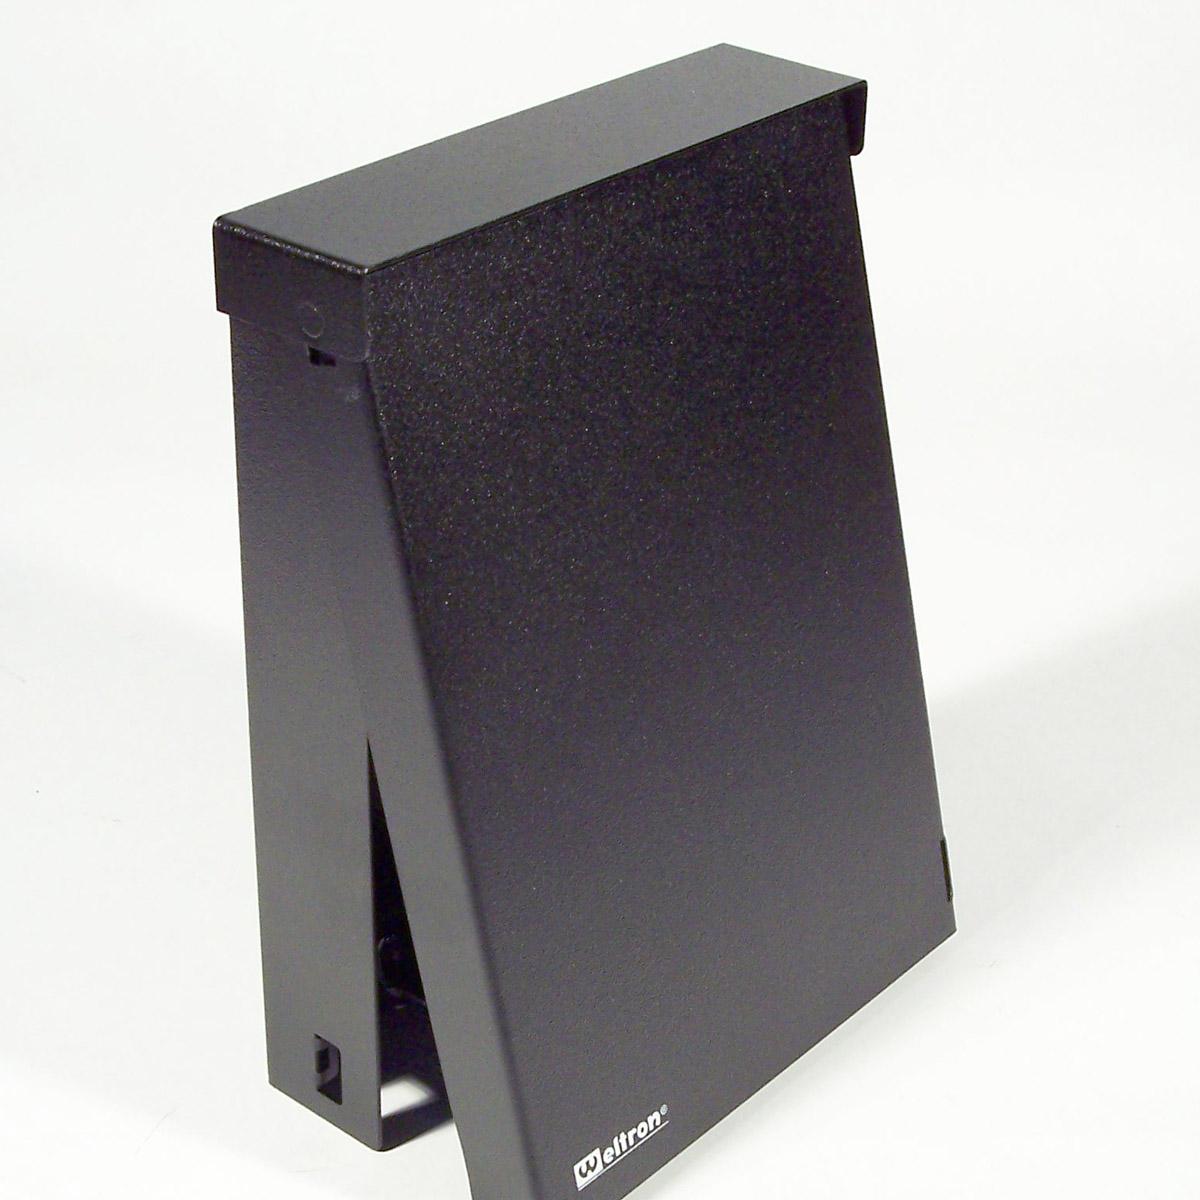 Outdoor Pa Public Address Sound System Speaker Baseball